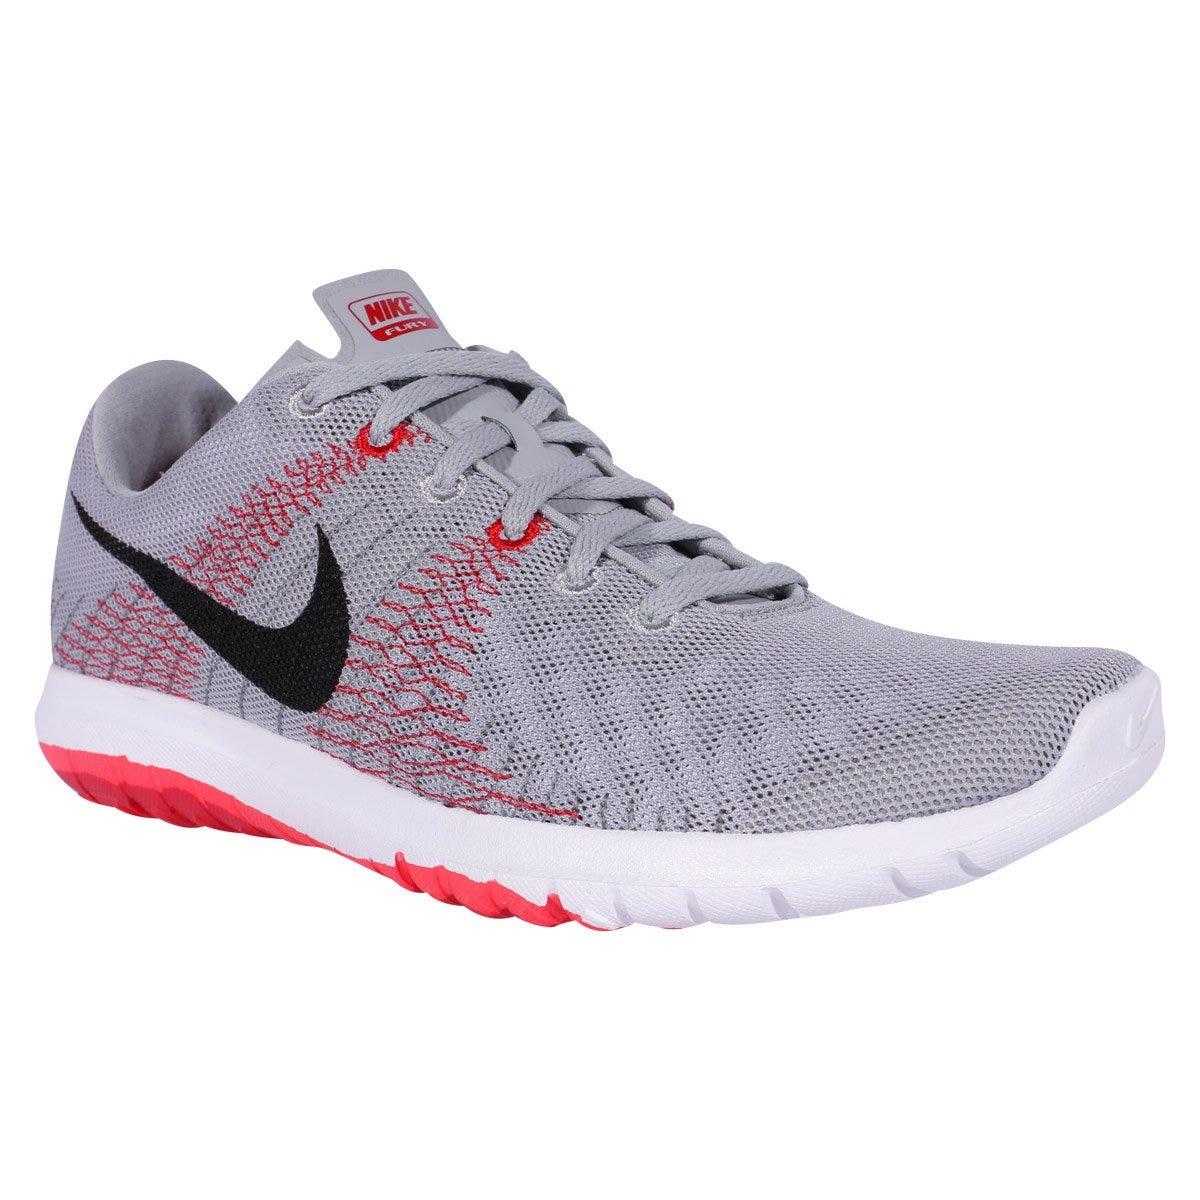 ... Nike Flex Fury Men s Training Shoe - Wolf Gray University Red Black ... fba11e781